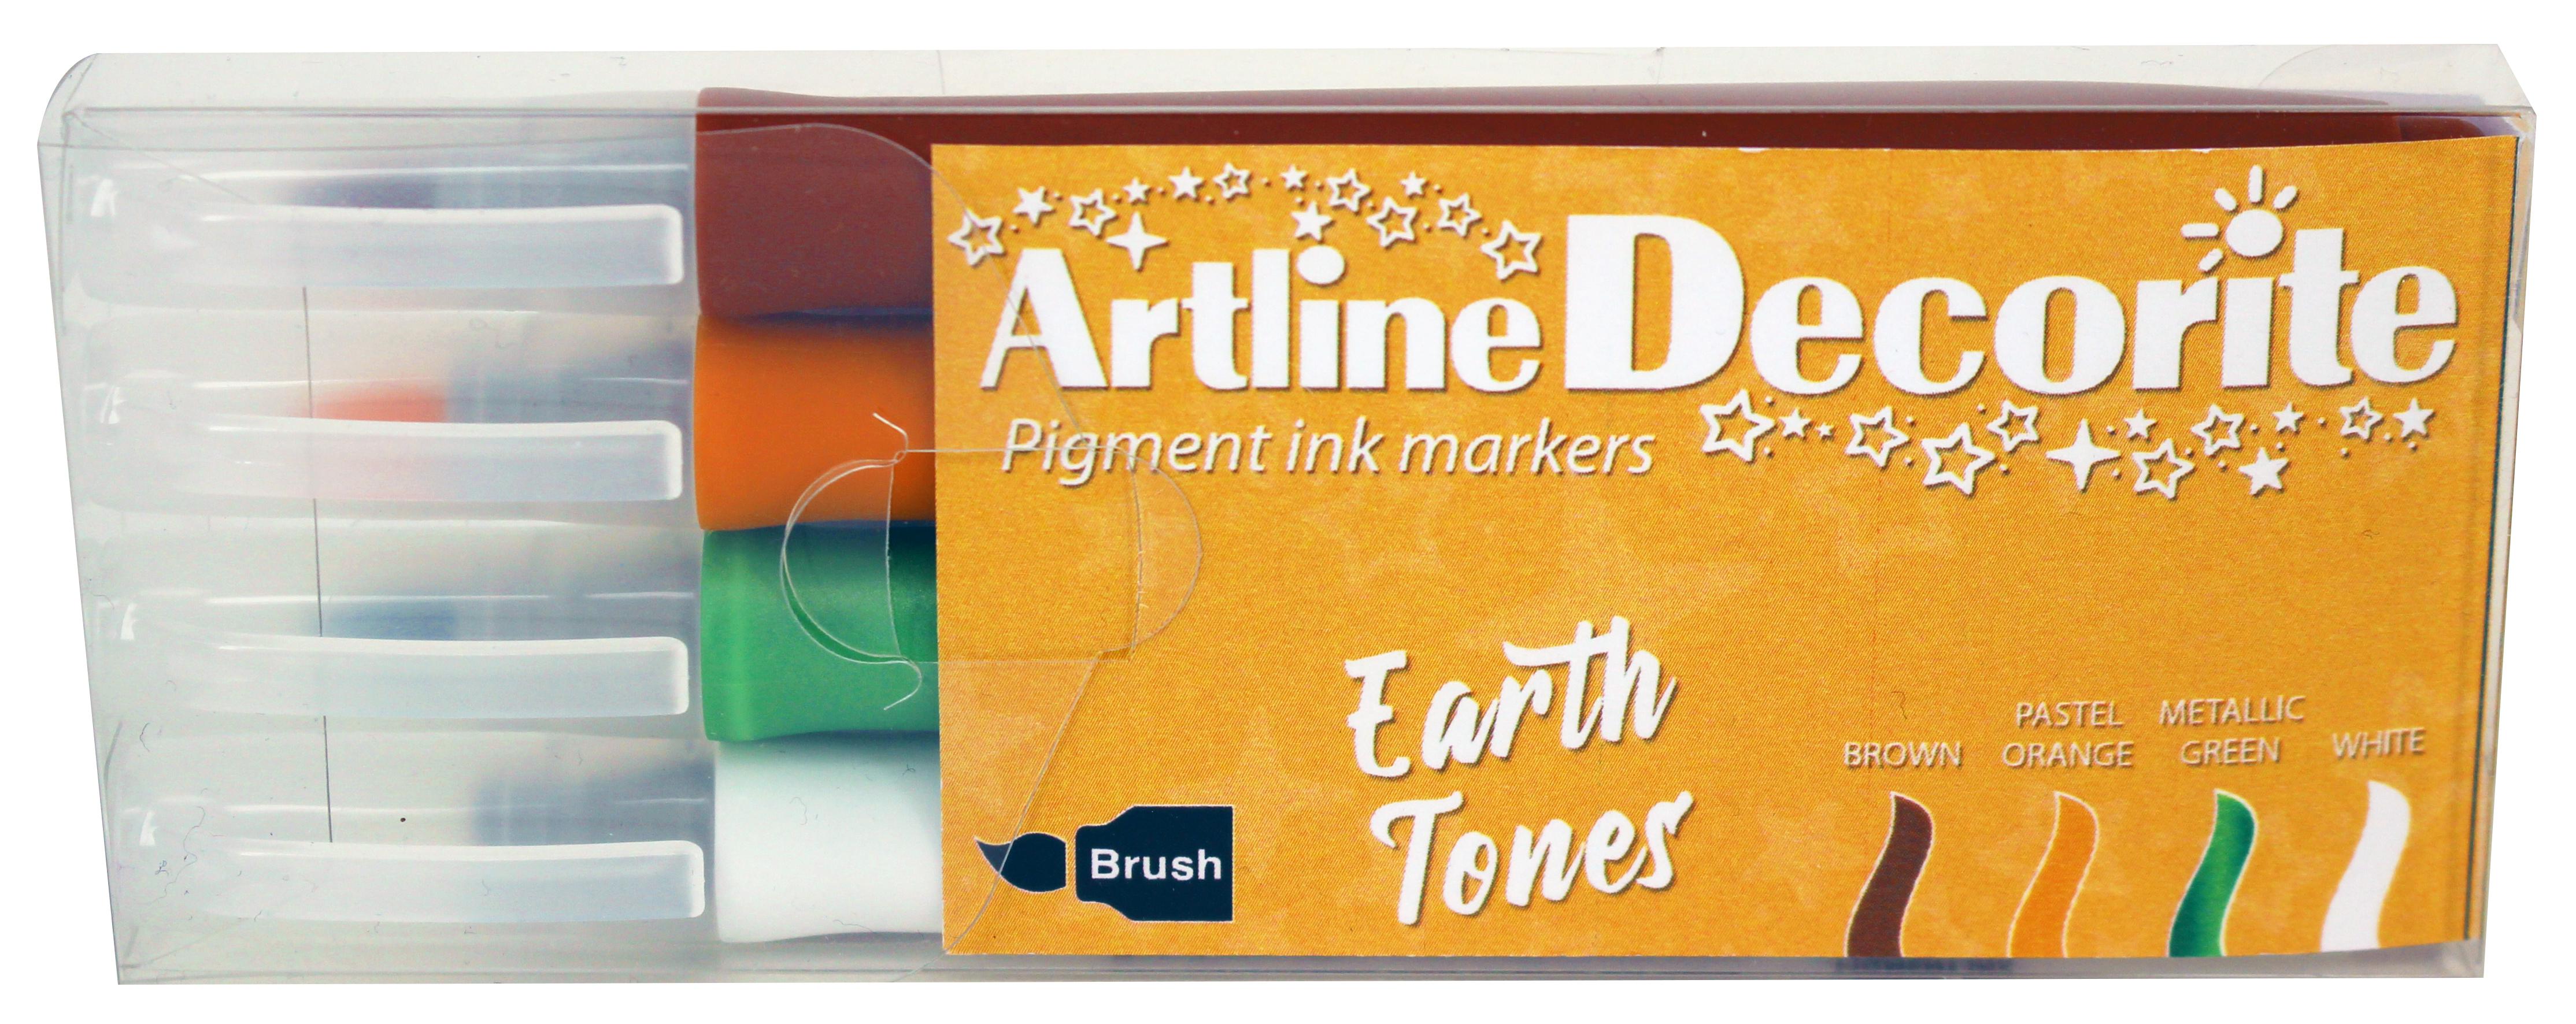 Artline Decorite Brush Earth 4-pk